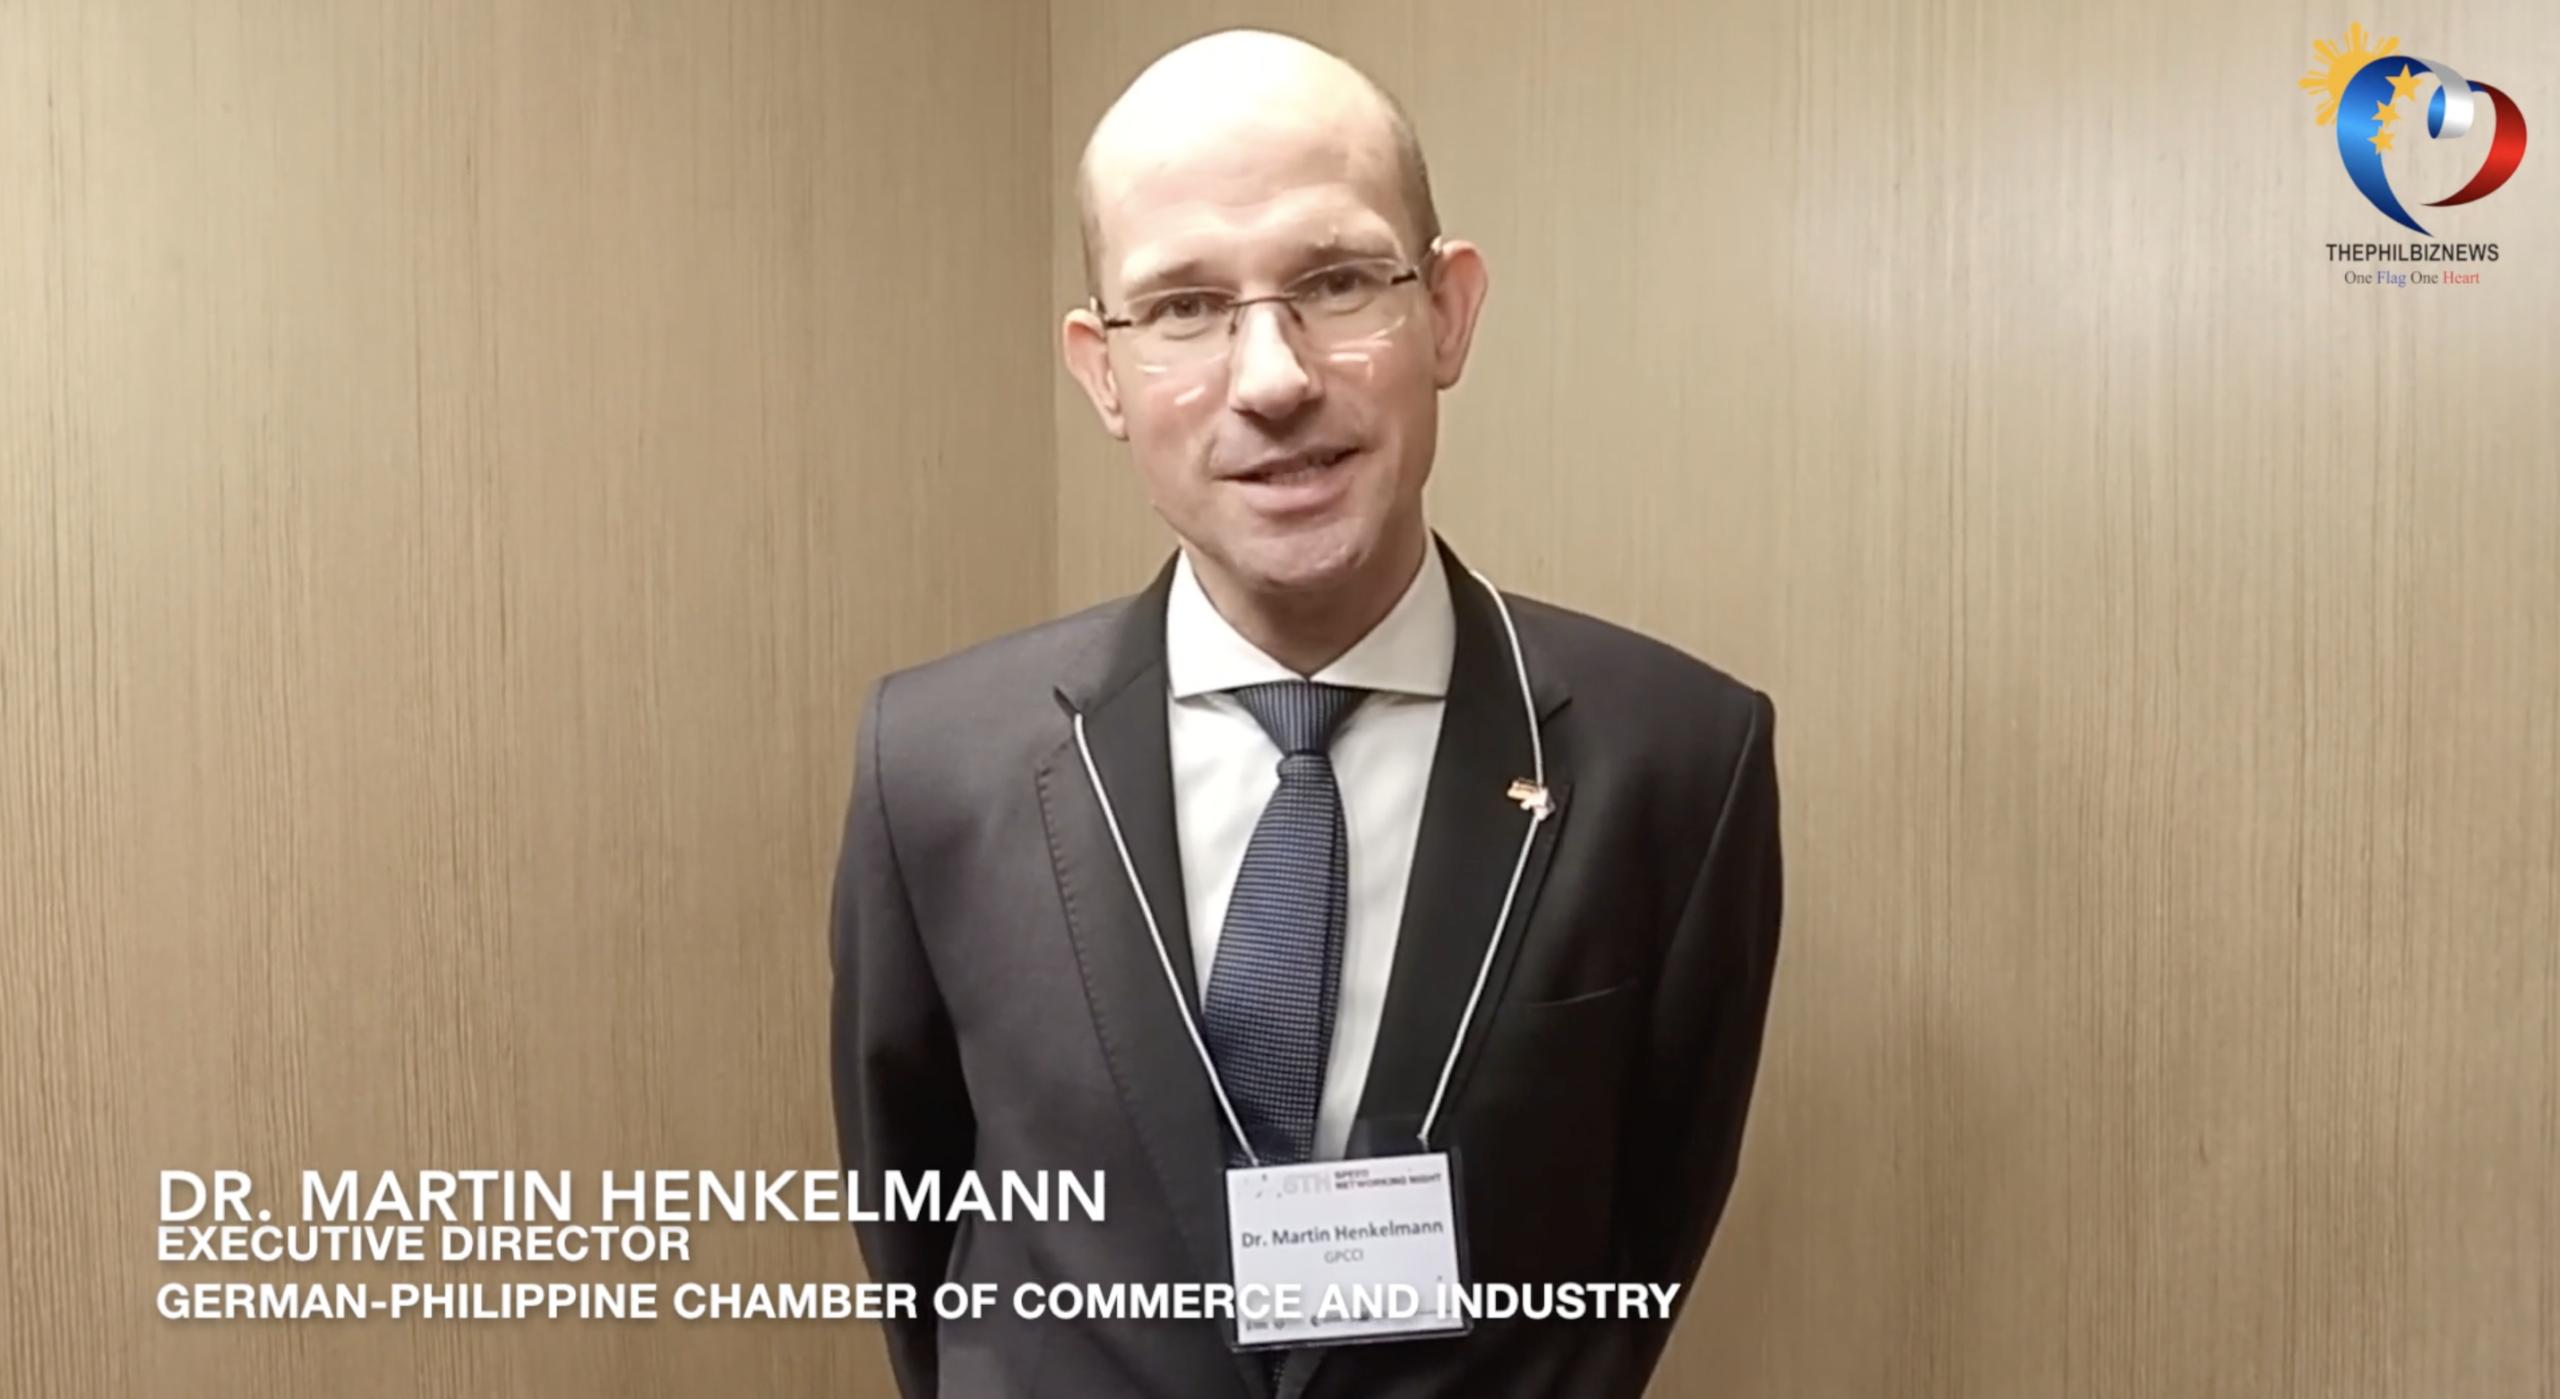 PEZA incentives can attract more German investors – Henkelmann